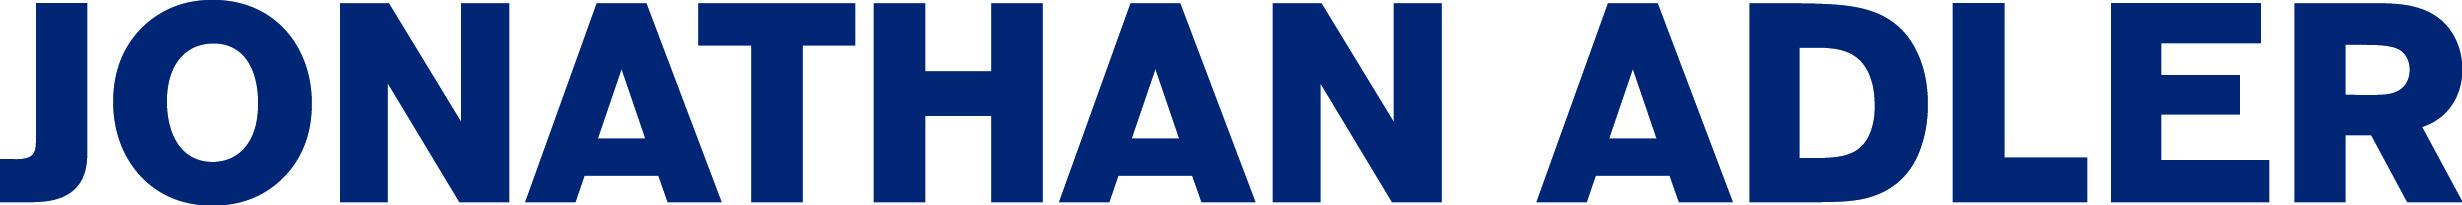 Jonathan_Adler-company_logo_default_crop_2462x205_q95_dee091_default_crop_2462x205_q95_200dee.jpg